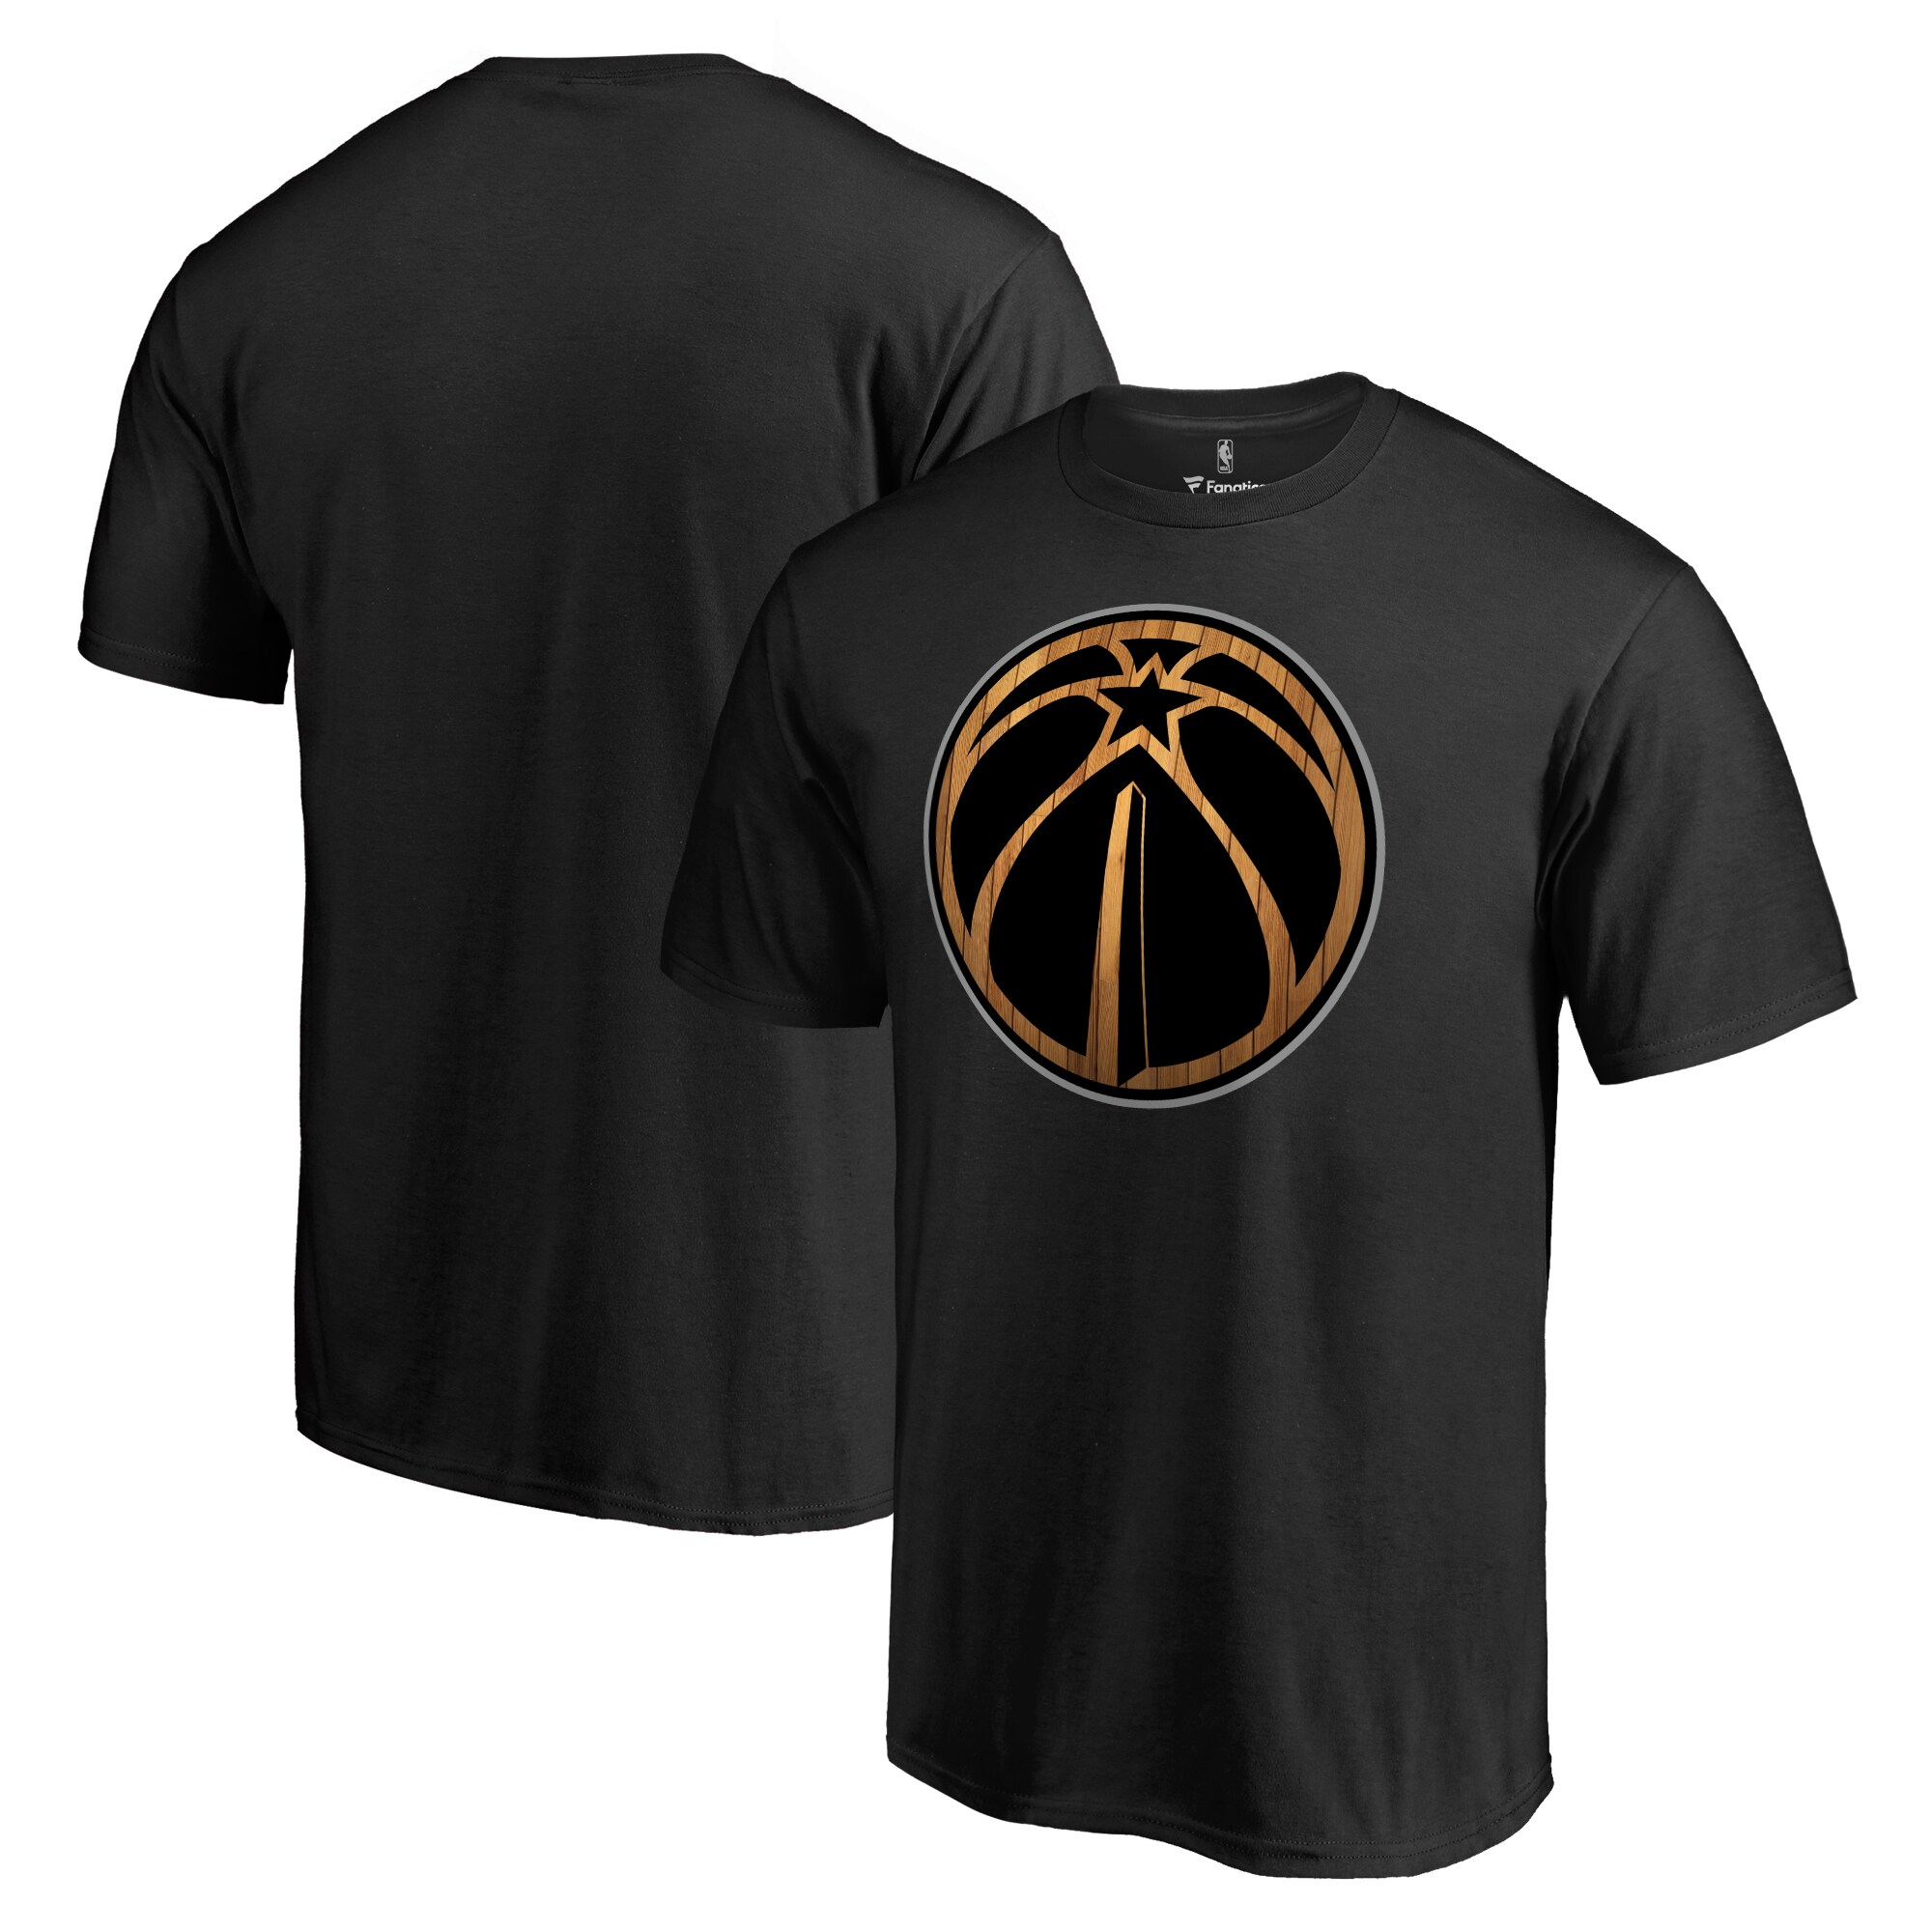 Washington Wizards Hardwood T-Shirt - Black